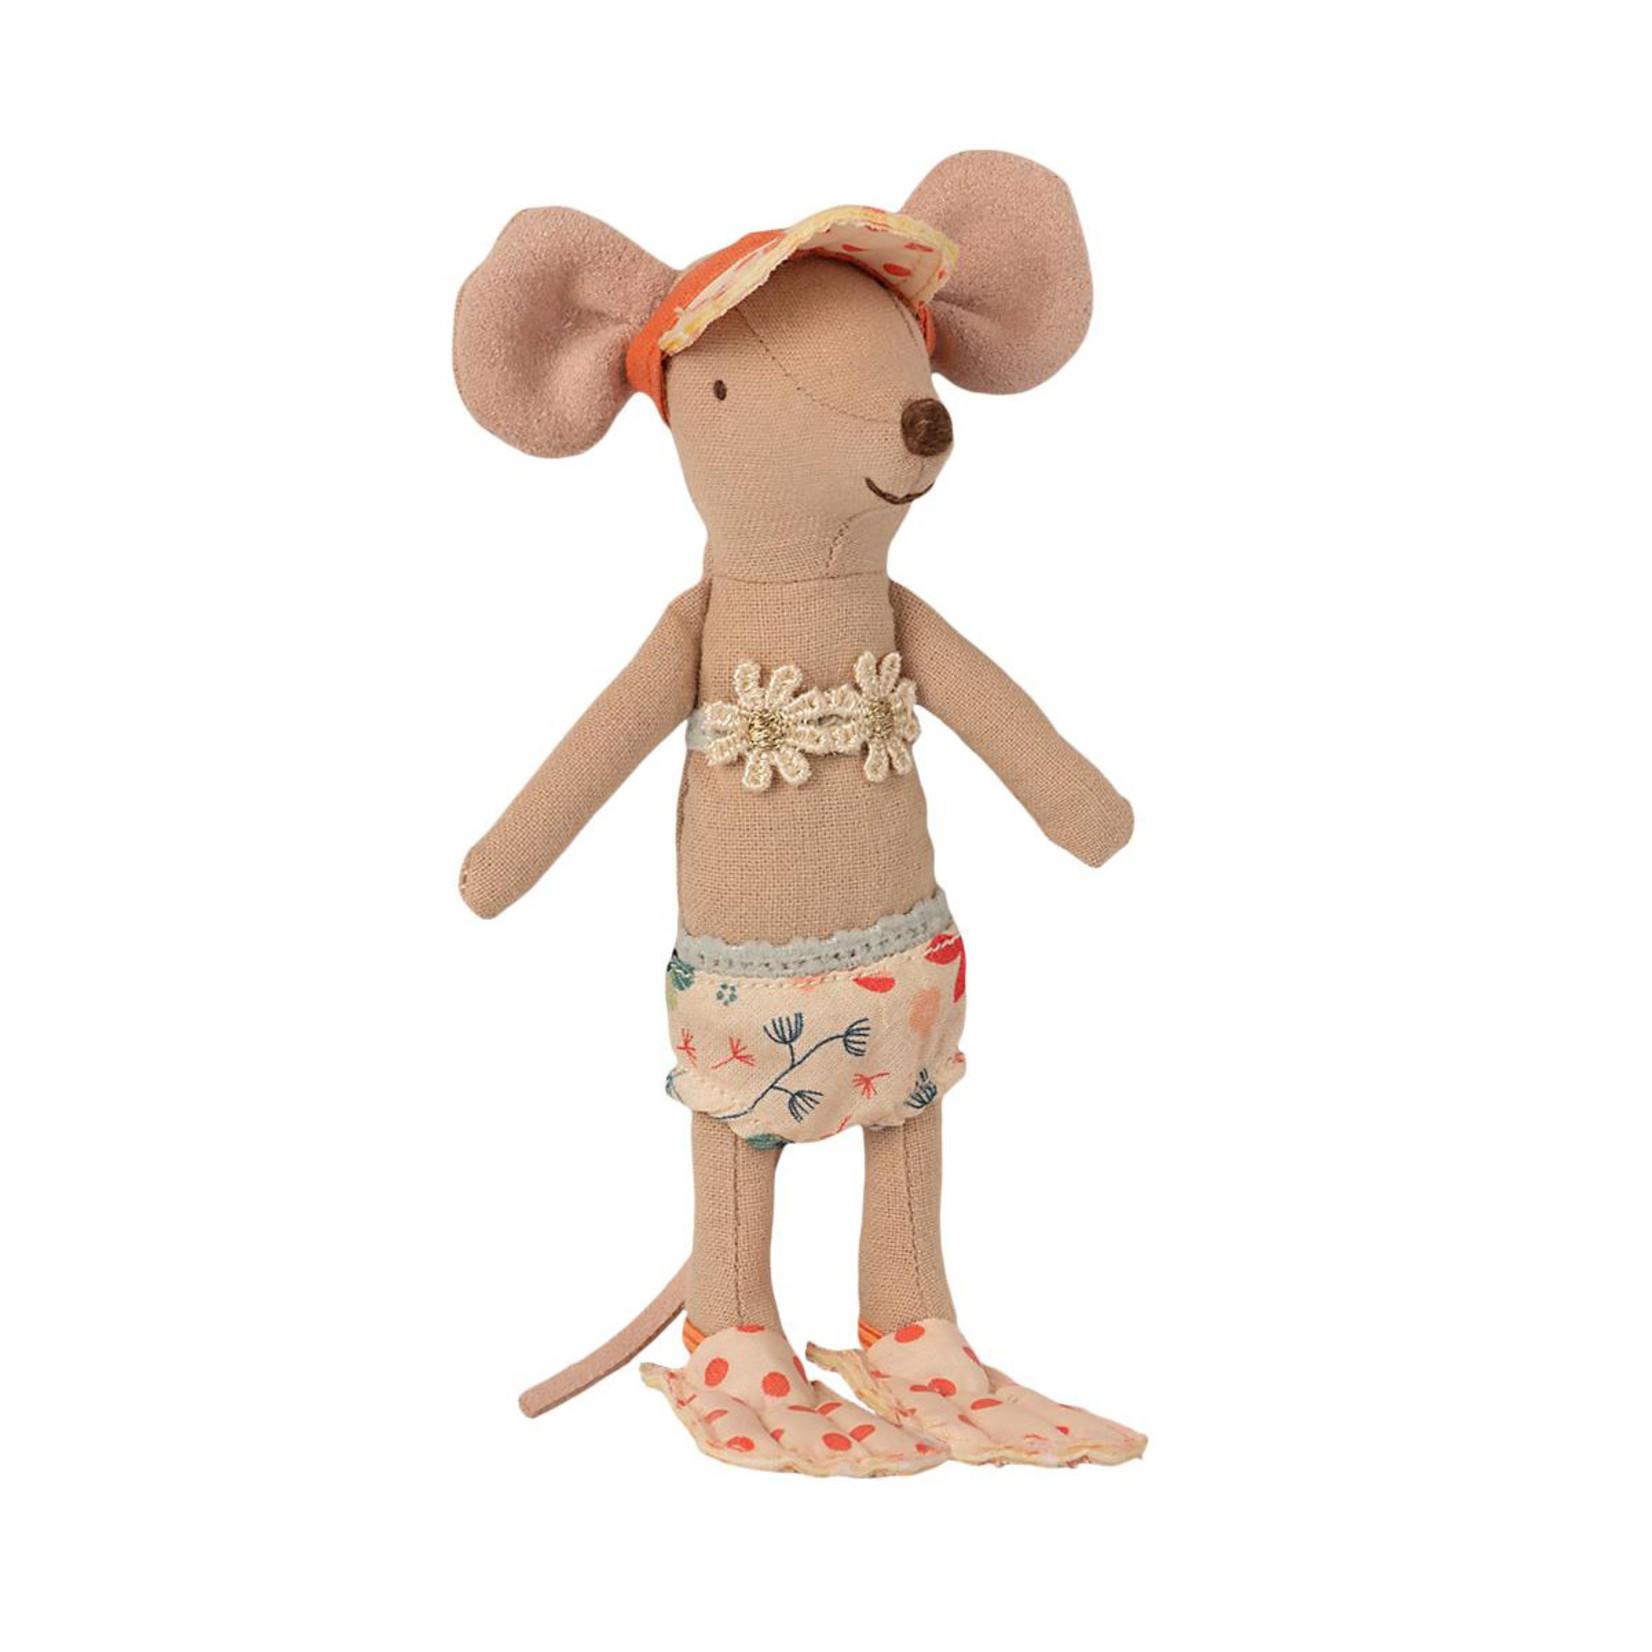 Maileg . NEW IN! Maileg Beach mice, Big sister in Cabin de Plage in Yellow Beach Hut